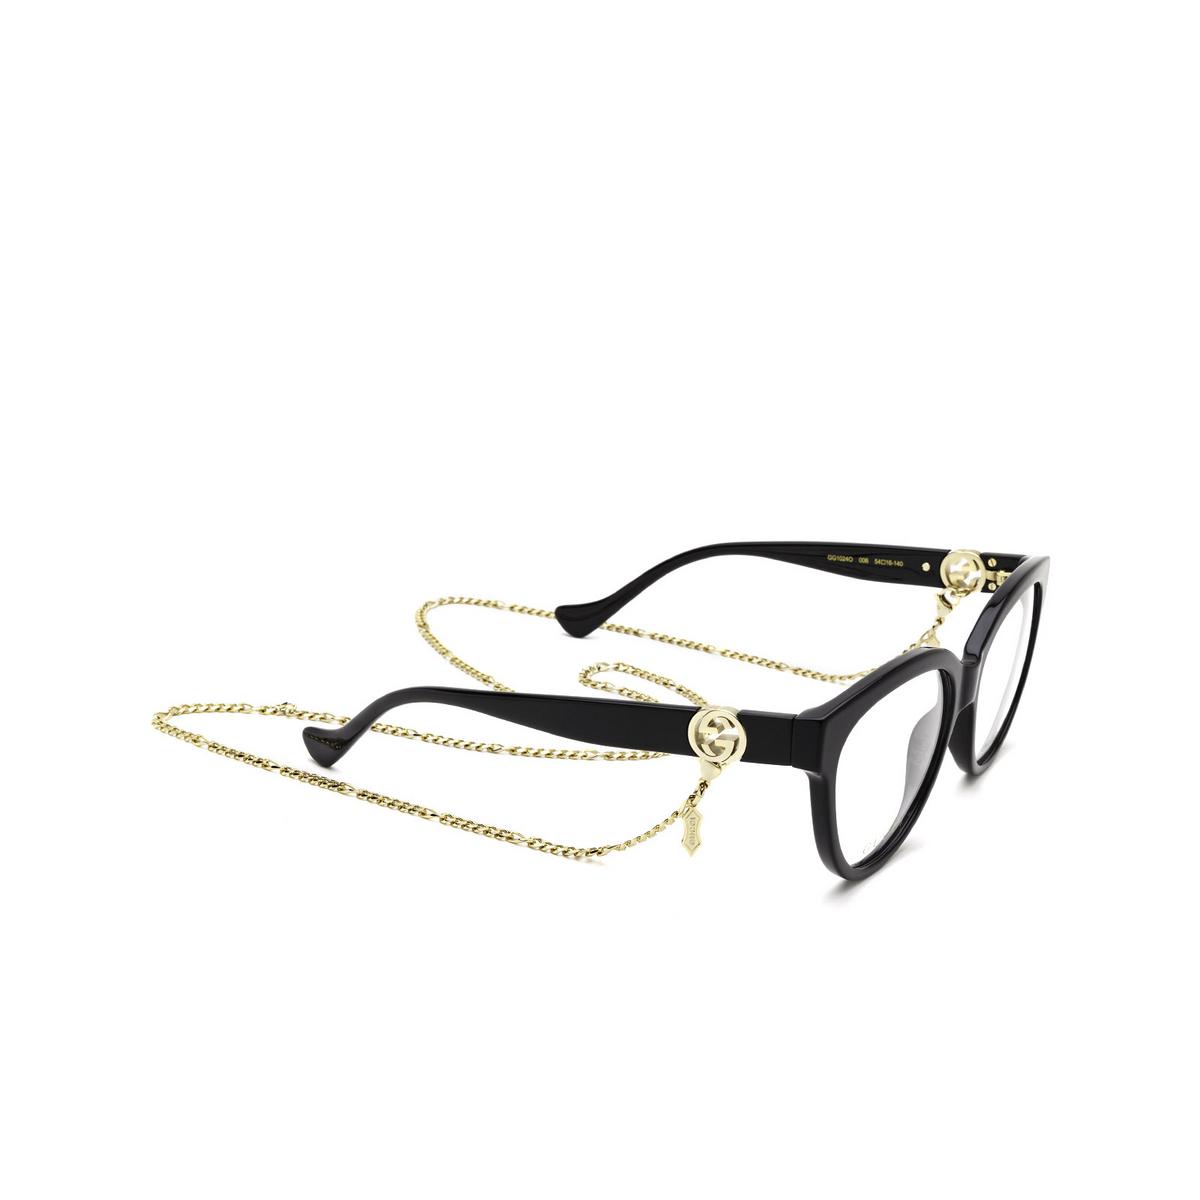 Gucci® Oval Eyeglasses: GG1024O color Black 006 - three-quarters view.